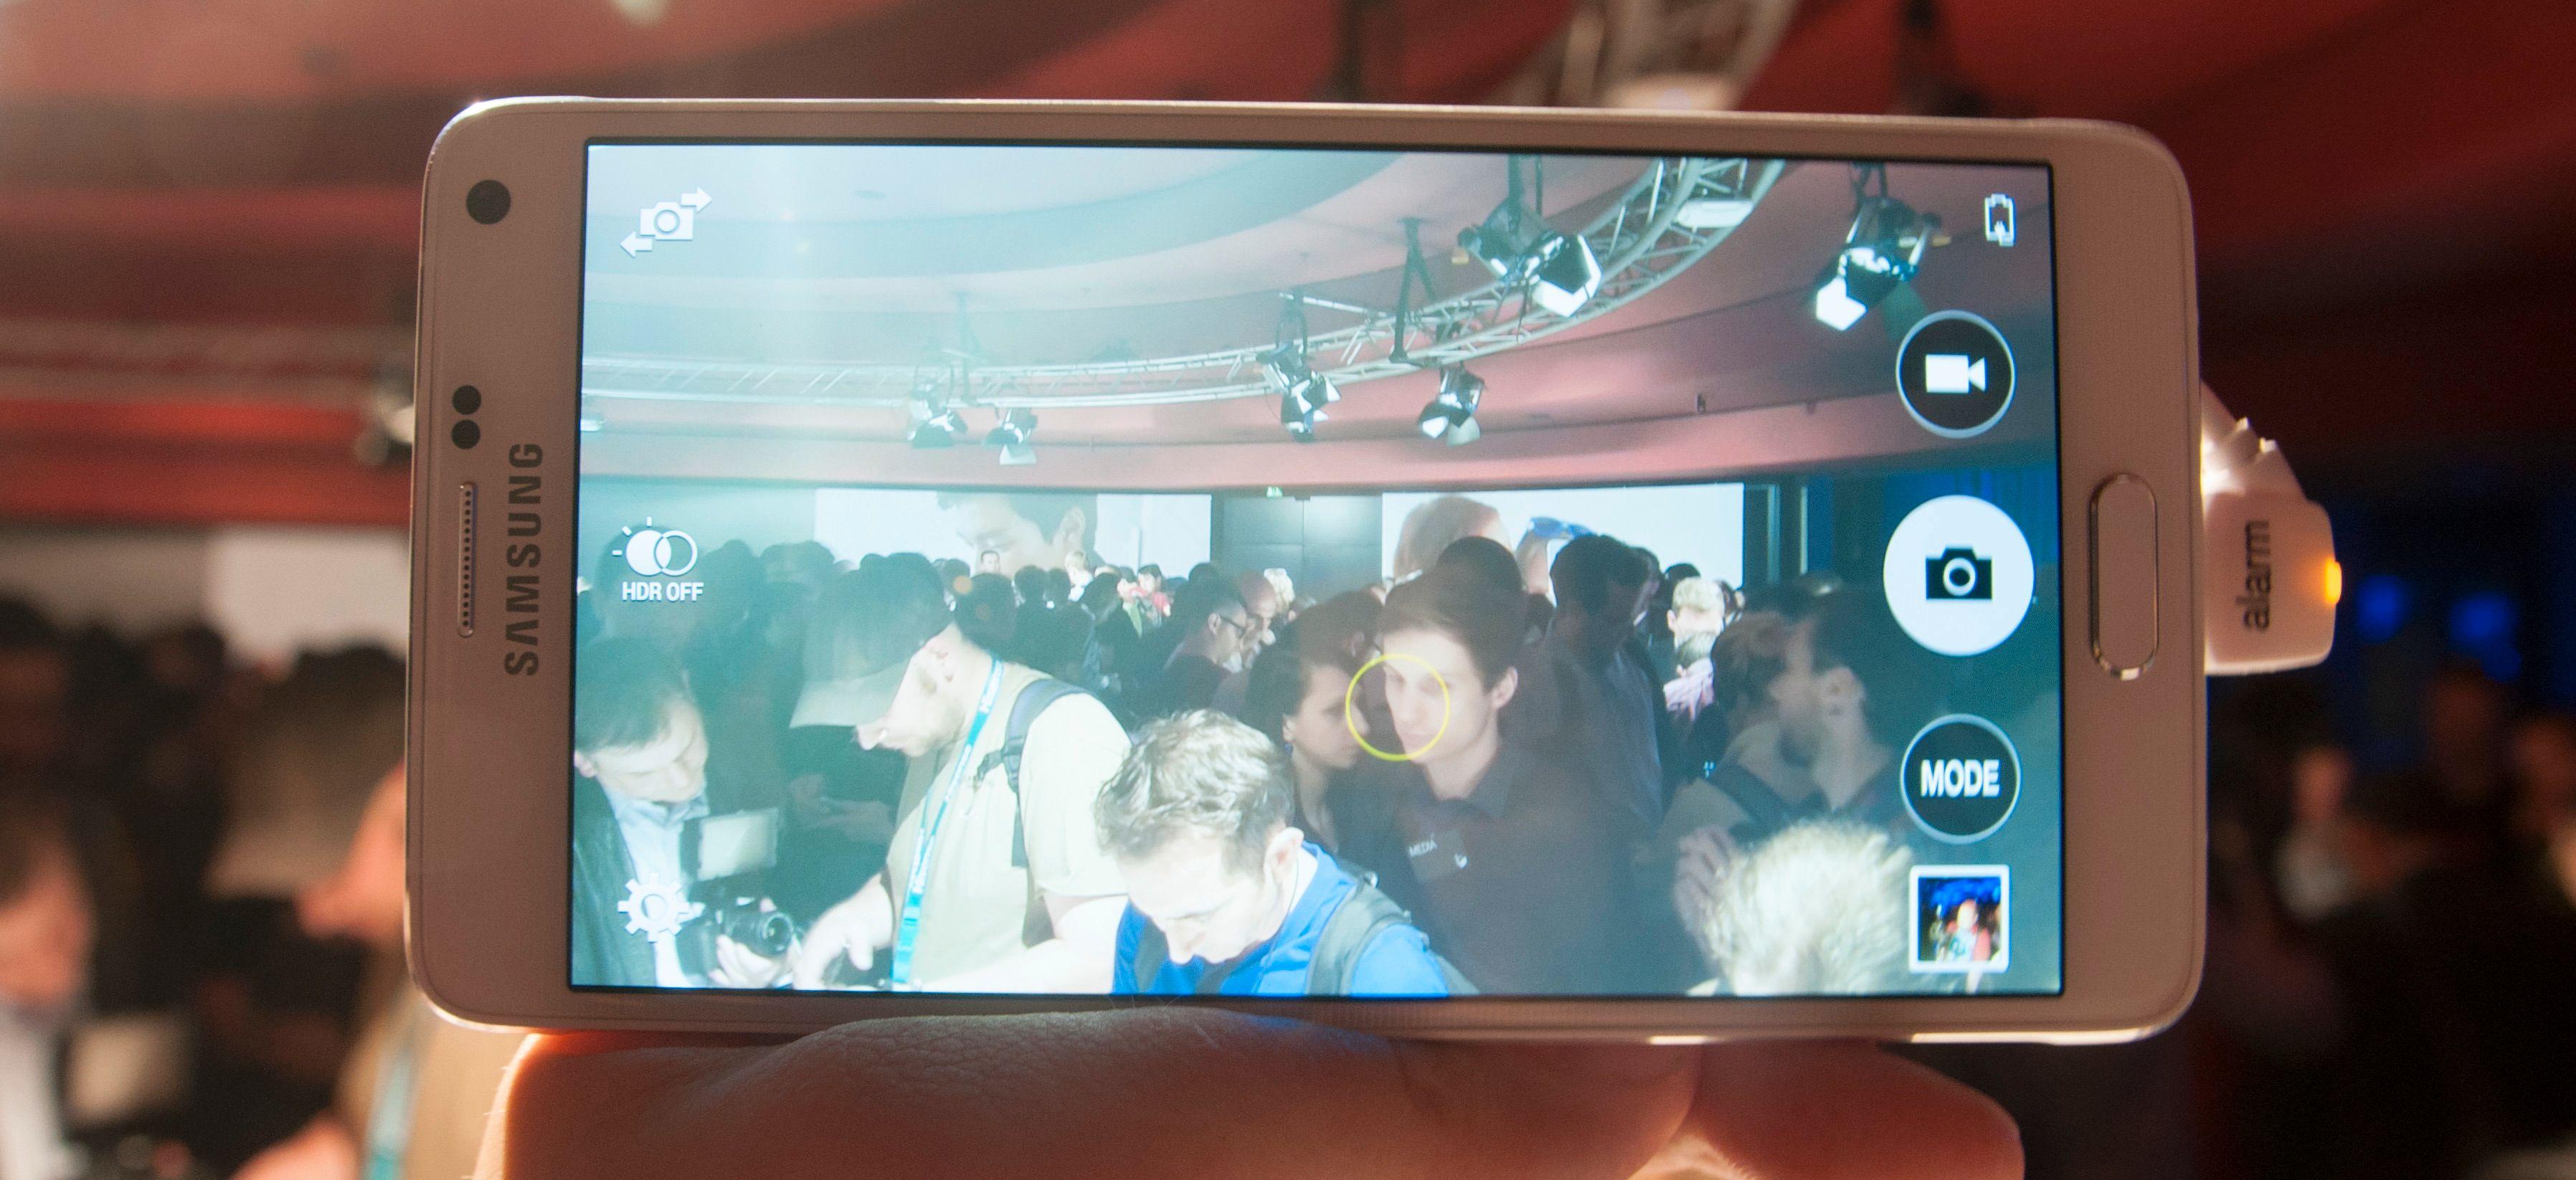 Kameraet er forbedret i Galaxy Note 4, og har nå optisk stabilisering. Det skal gi bedre bilder i mørke omgivelser.Foto: Finn Jarle Kvalheim, Amobil.no